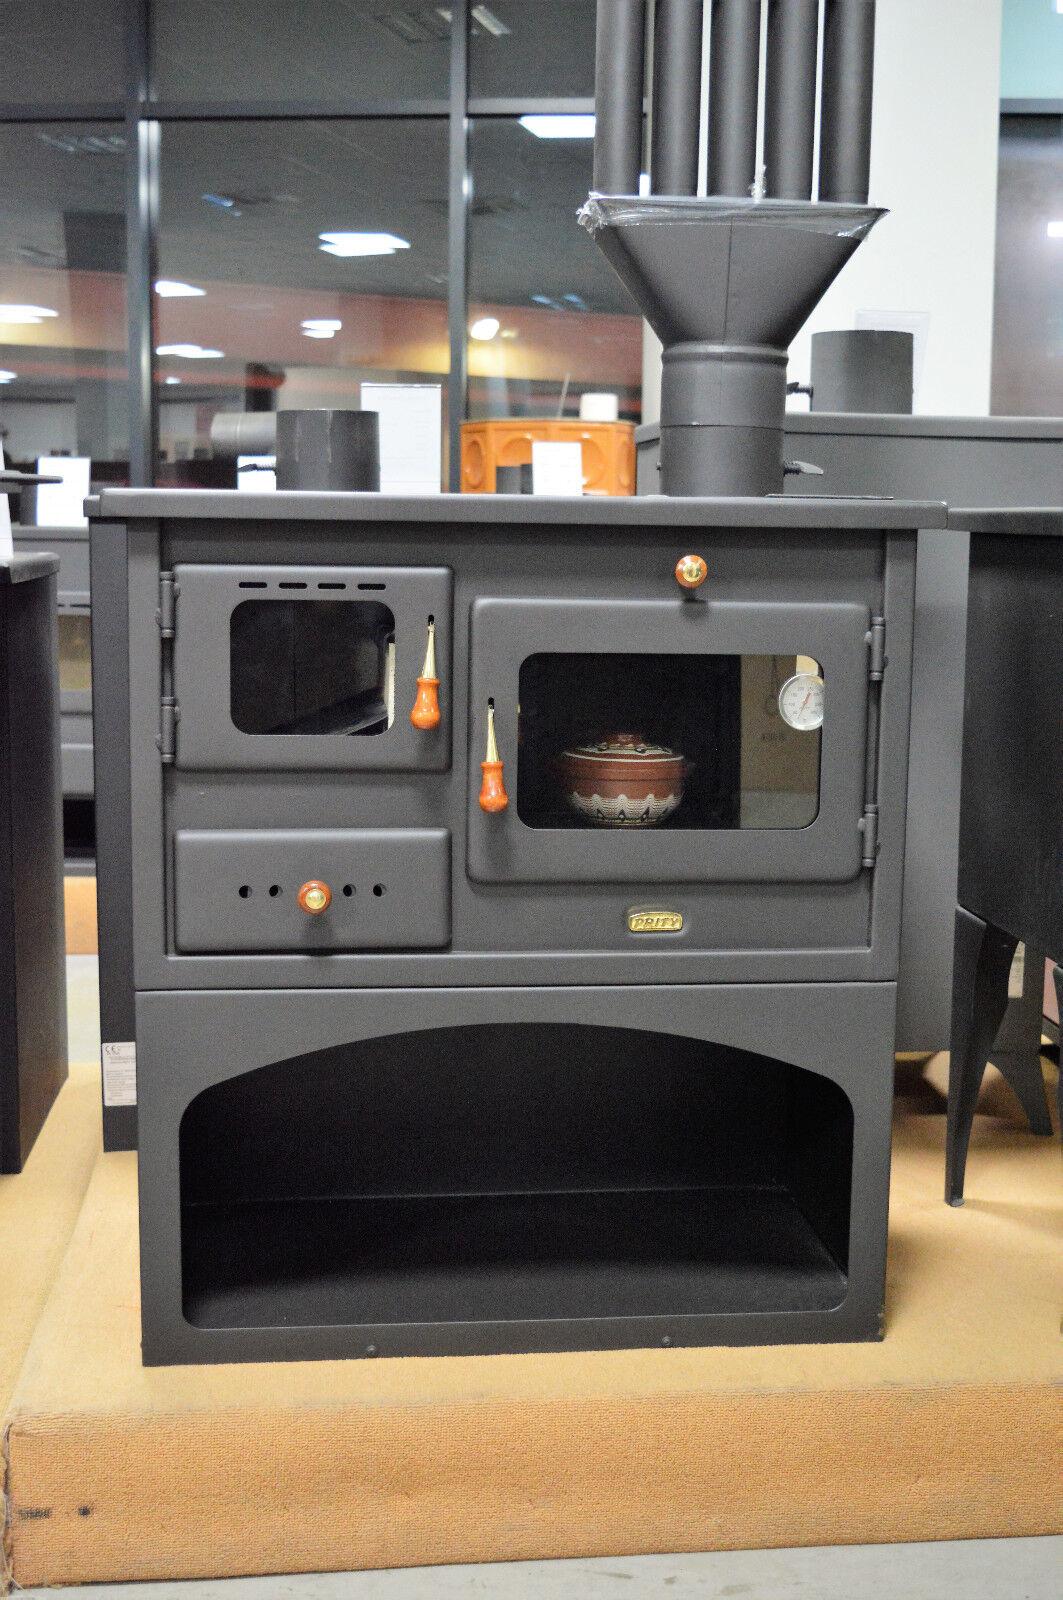 Holz Verbrennung Gusseisen Top Feste Brennstoffe Kochen